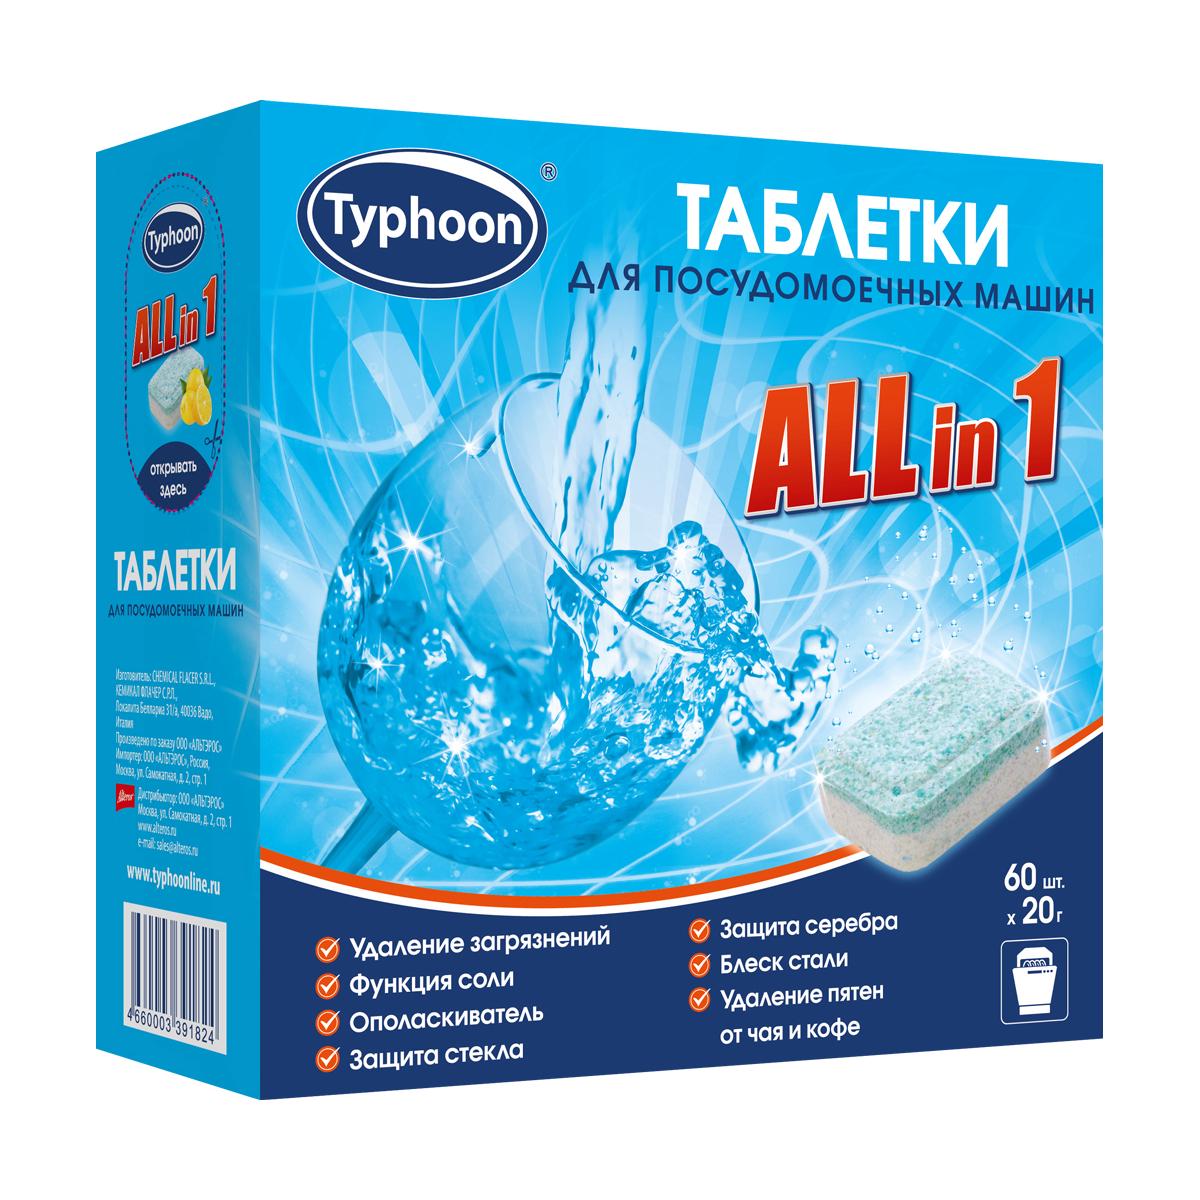 Таблетки Тайфун All in 1 для посудомоечных машин 60 шт